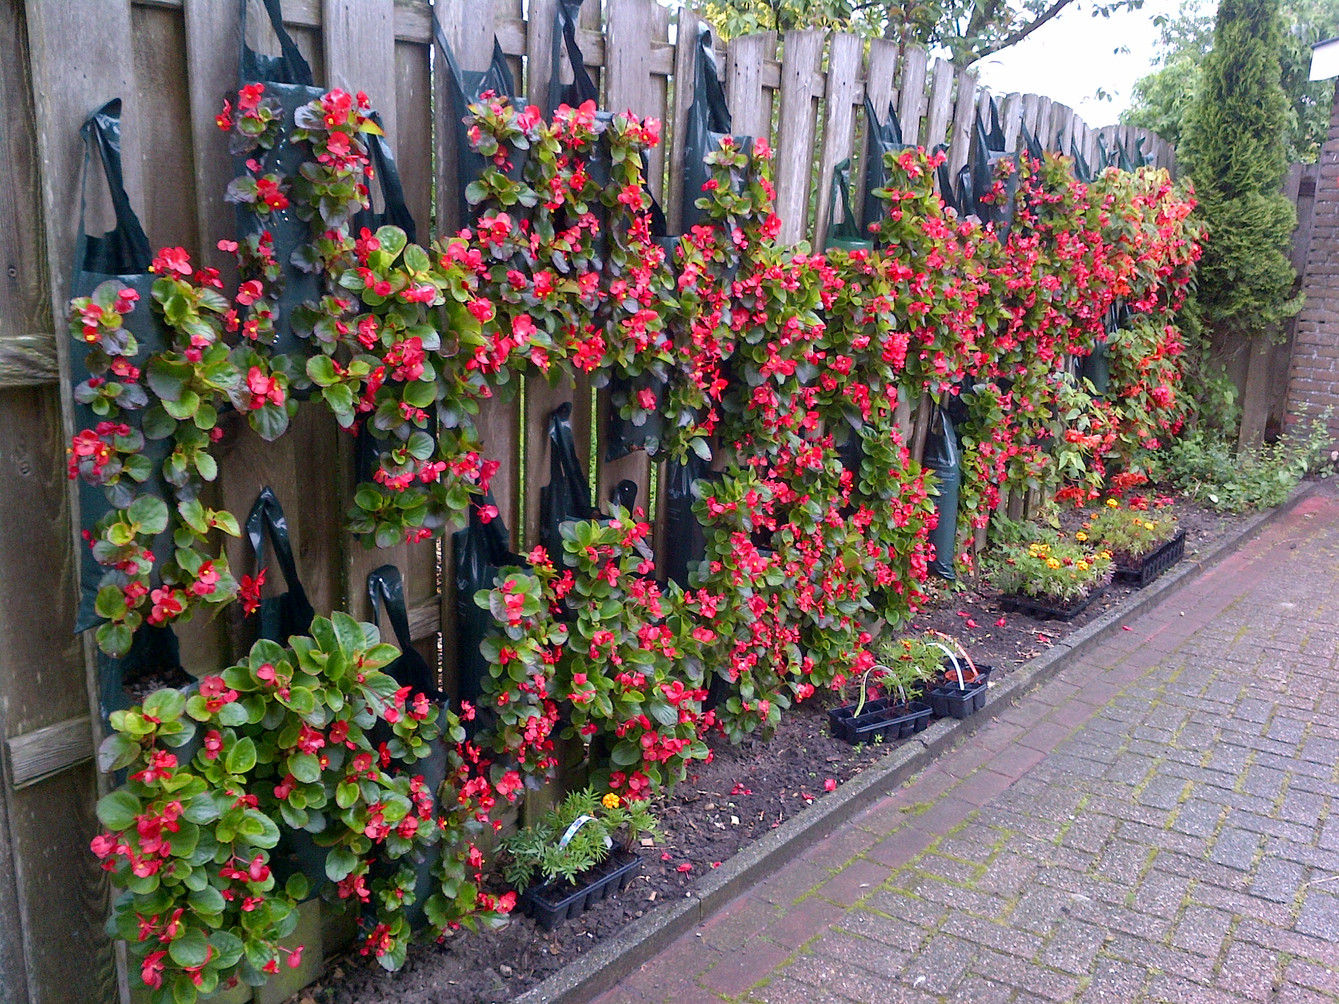 Begonia wall, Dantumadiel, NL